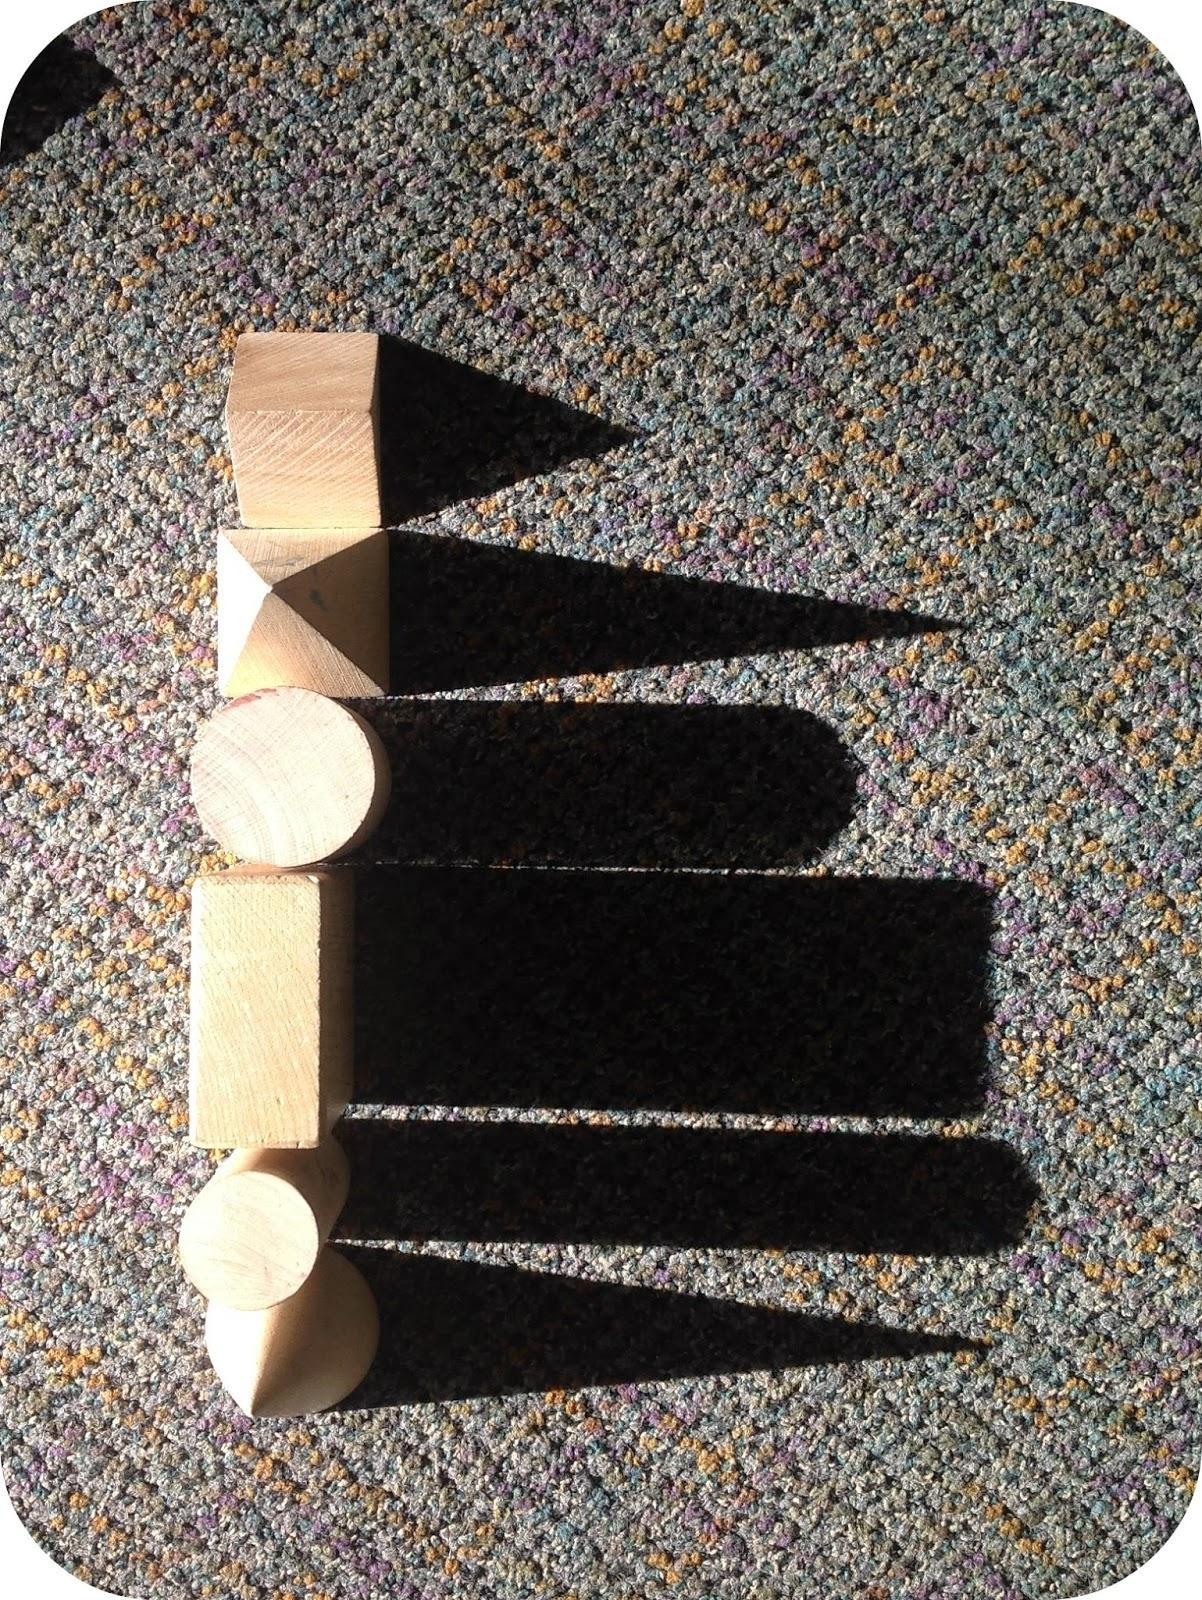 Joyful Learning In Kc Three Dimensional Shapes